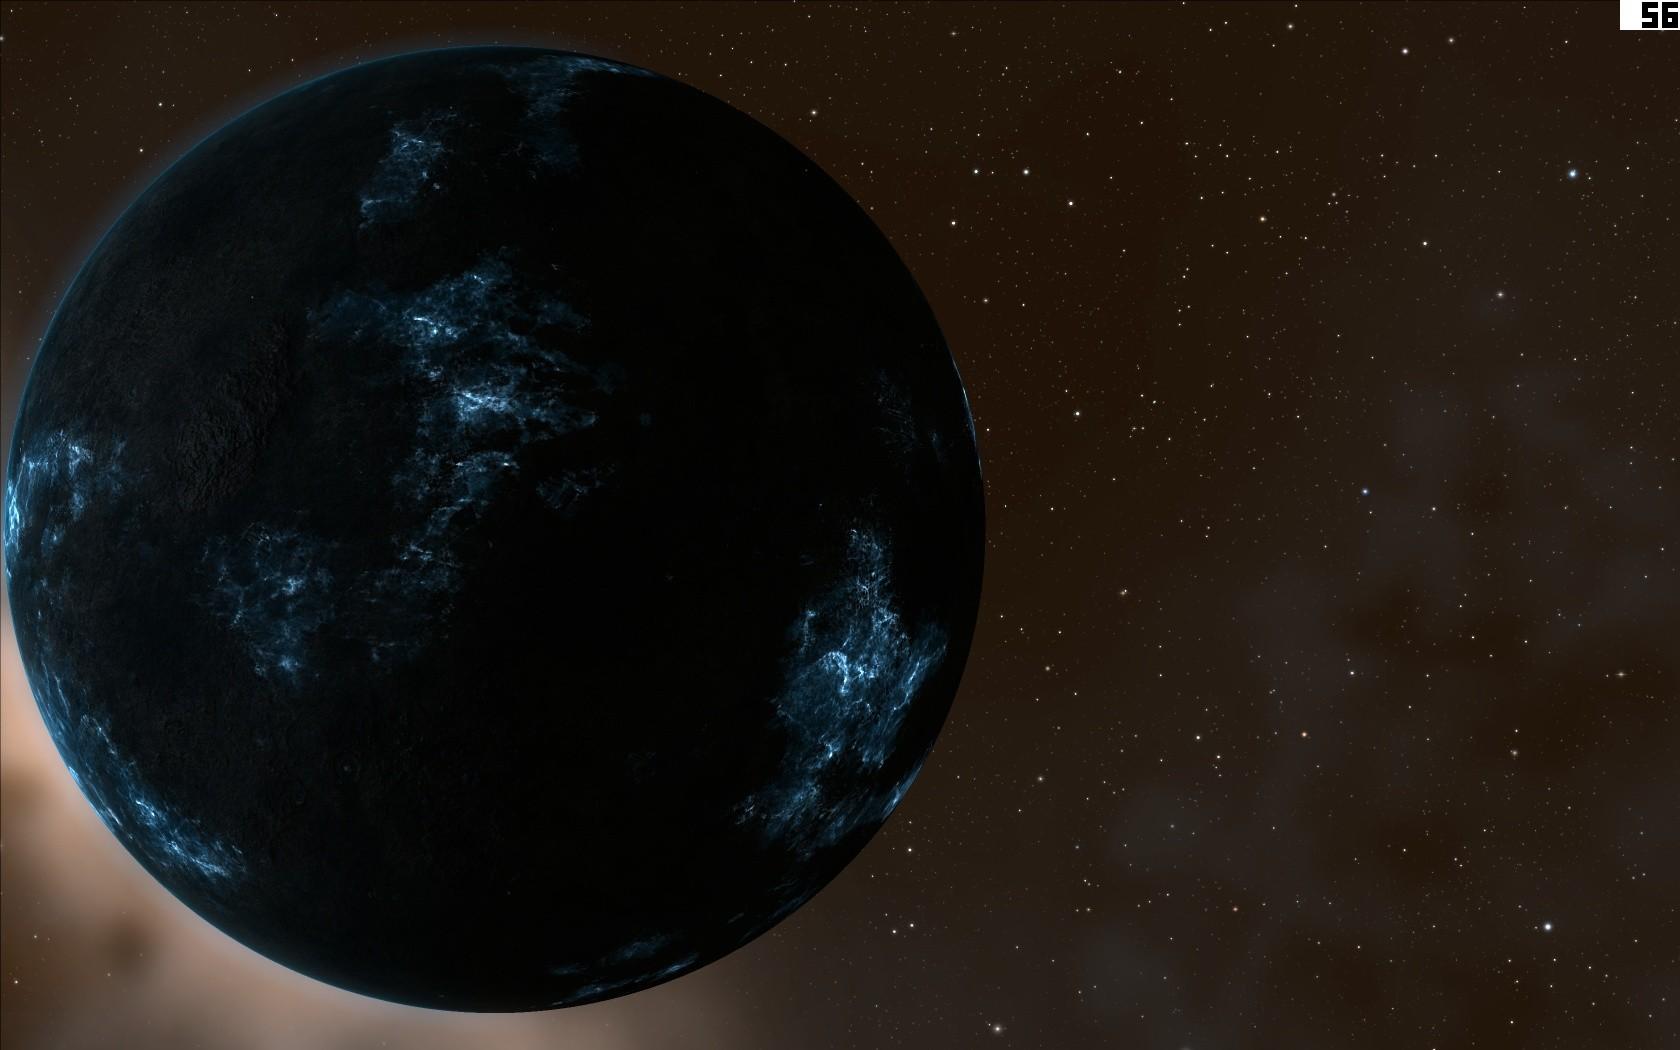 WOW found it at last! Plasma planet win! 8032e6c9-ef63-4540-81a8-cdef6c3b2a06